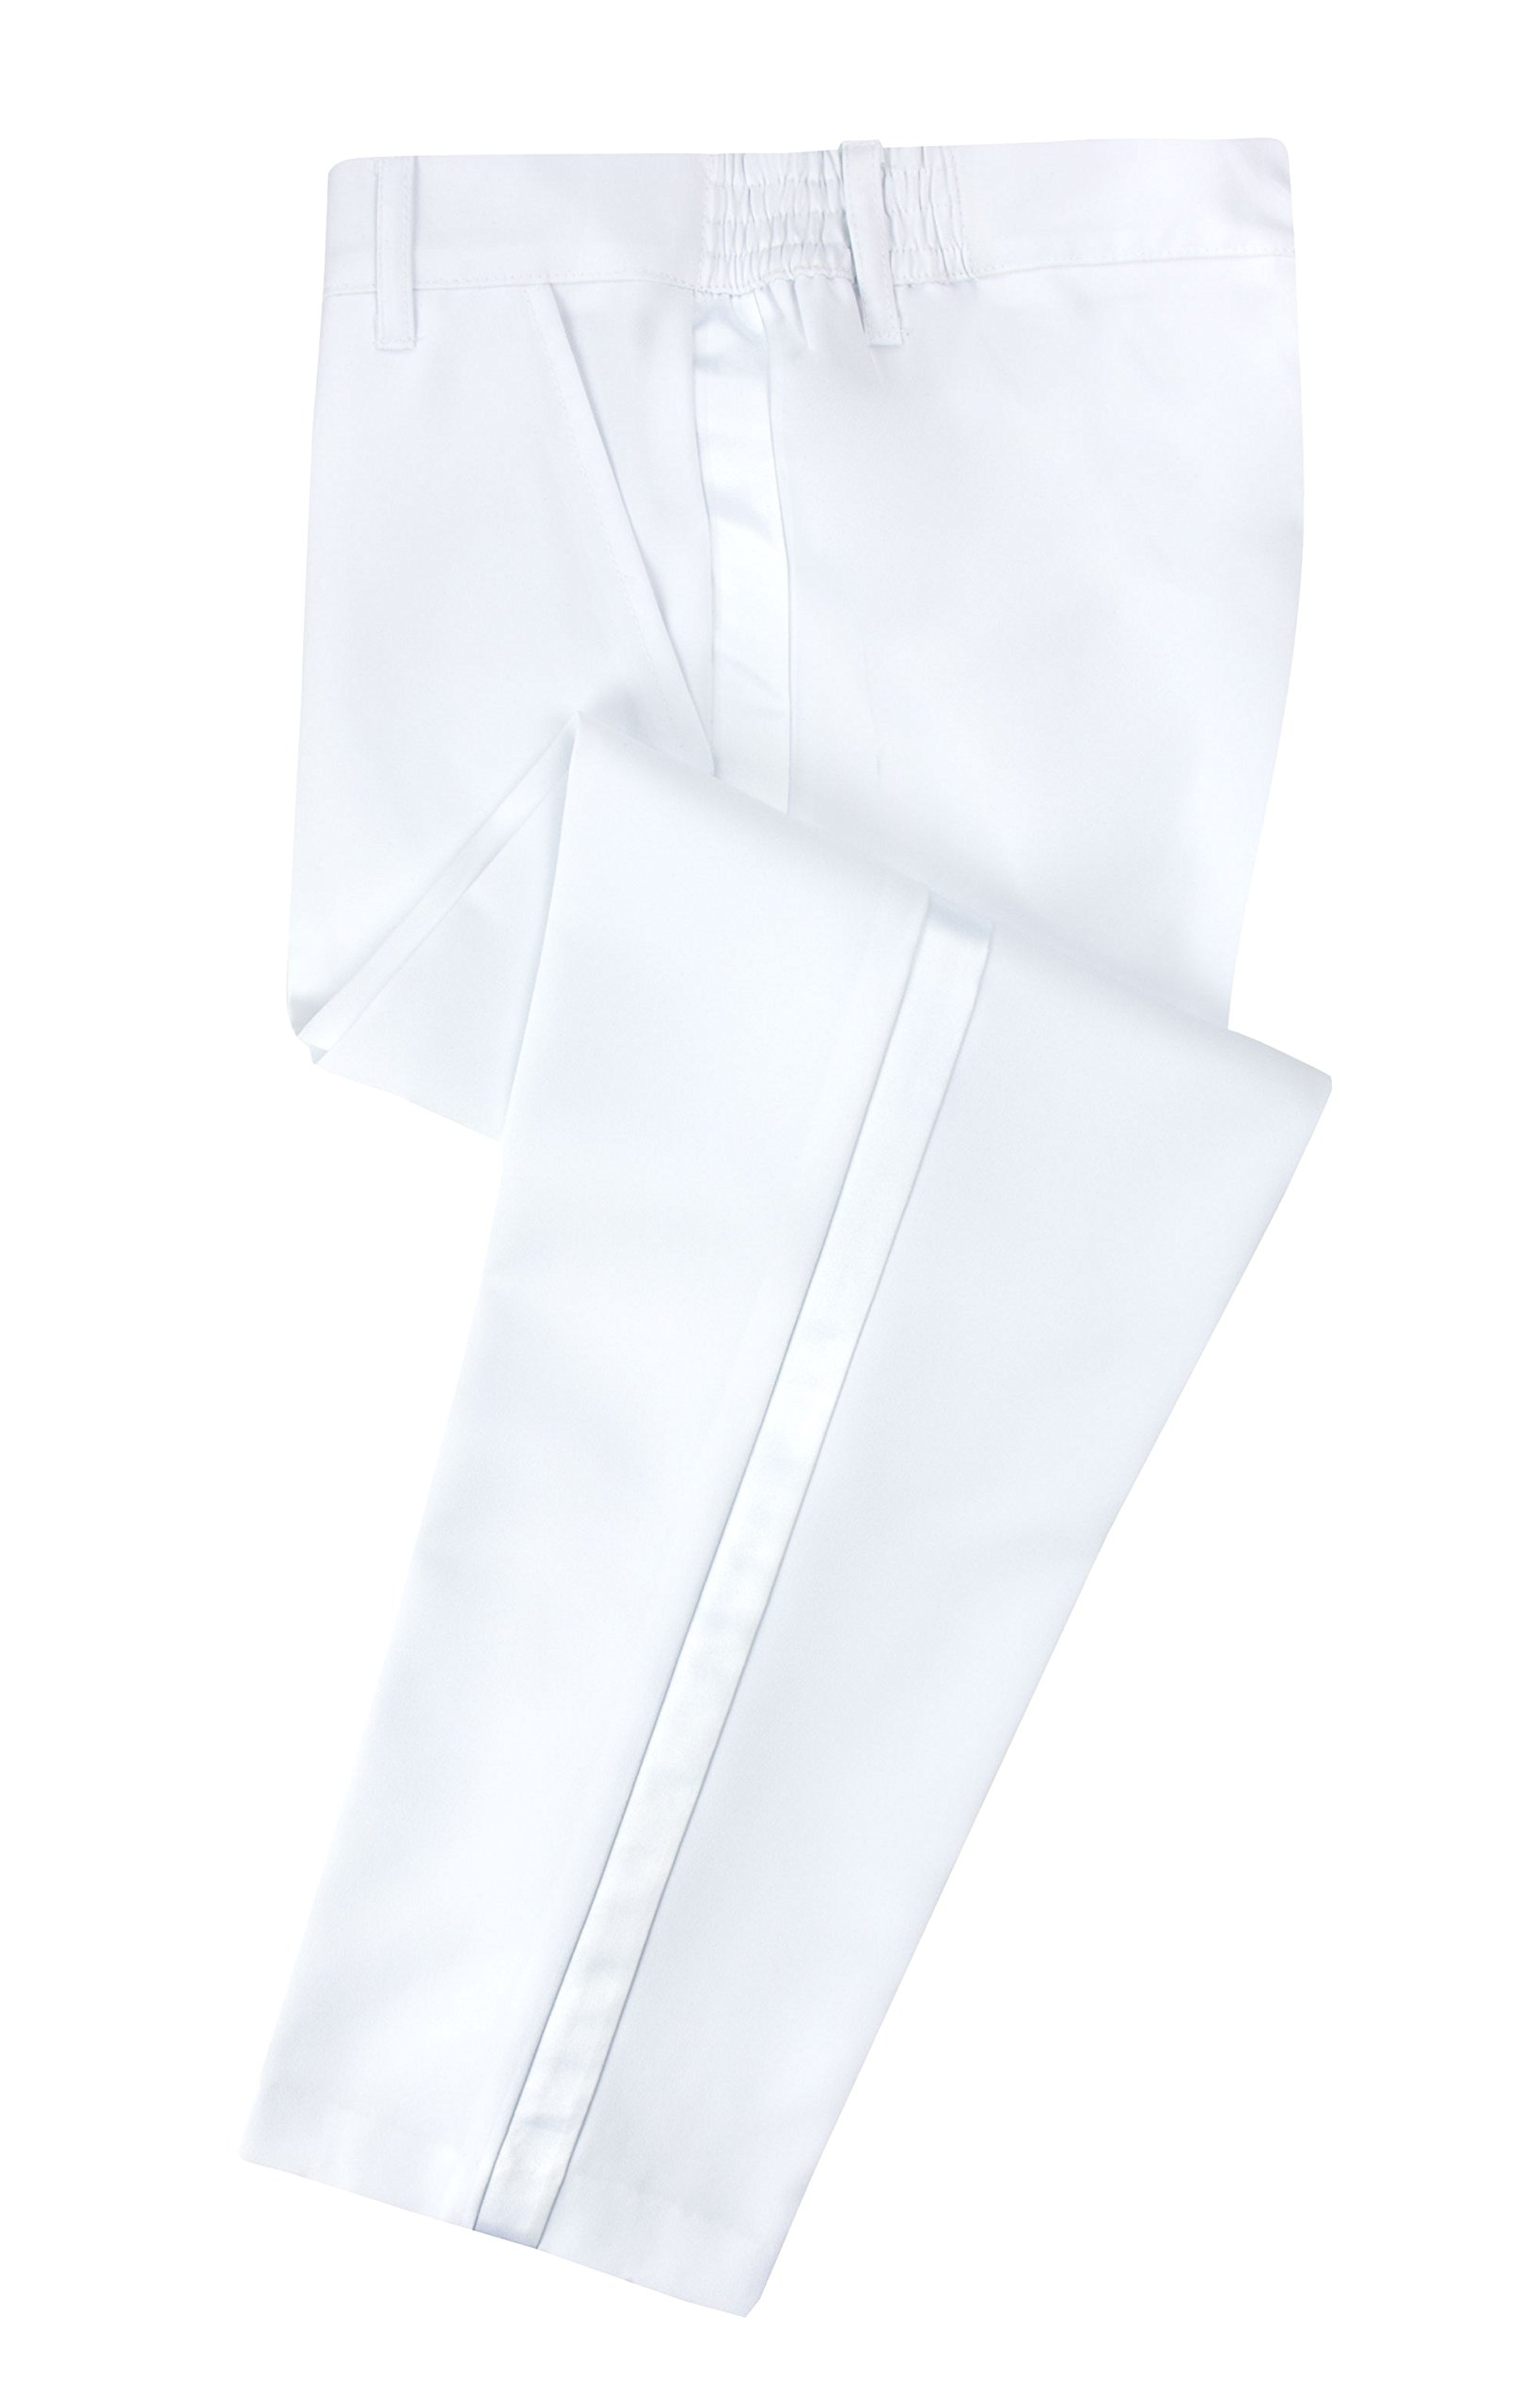 Spring Notion Boys' Tuxedo Suspender Set 08 Style 06 by Spring Notion (Image #2)